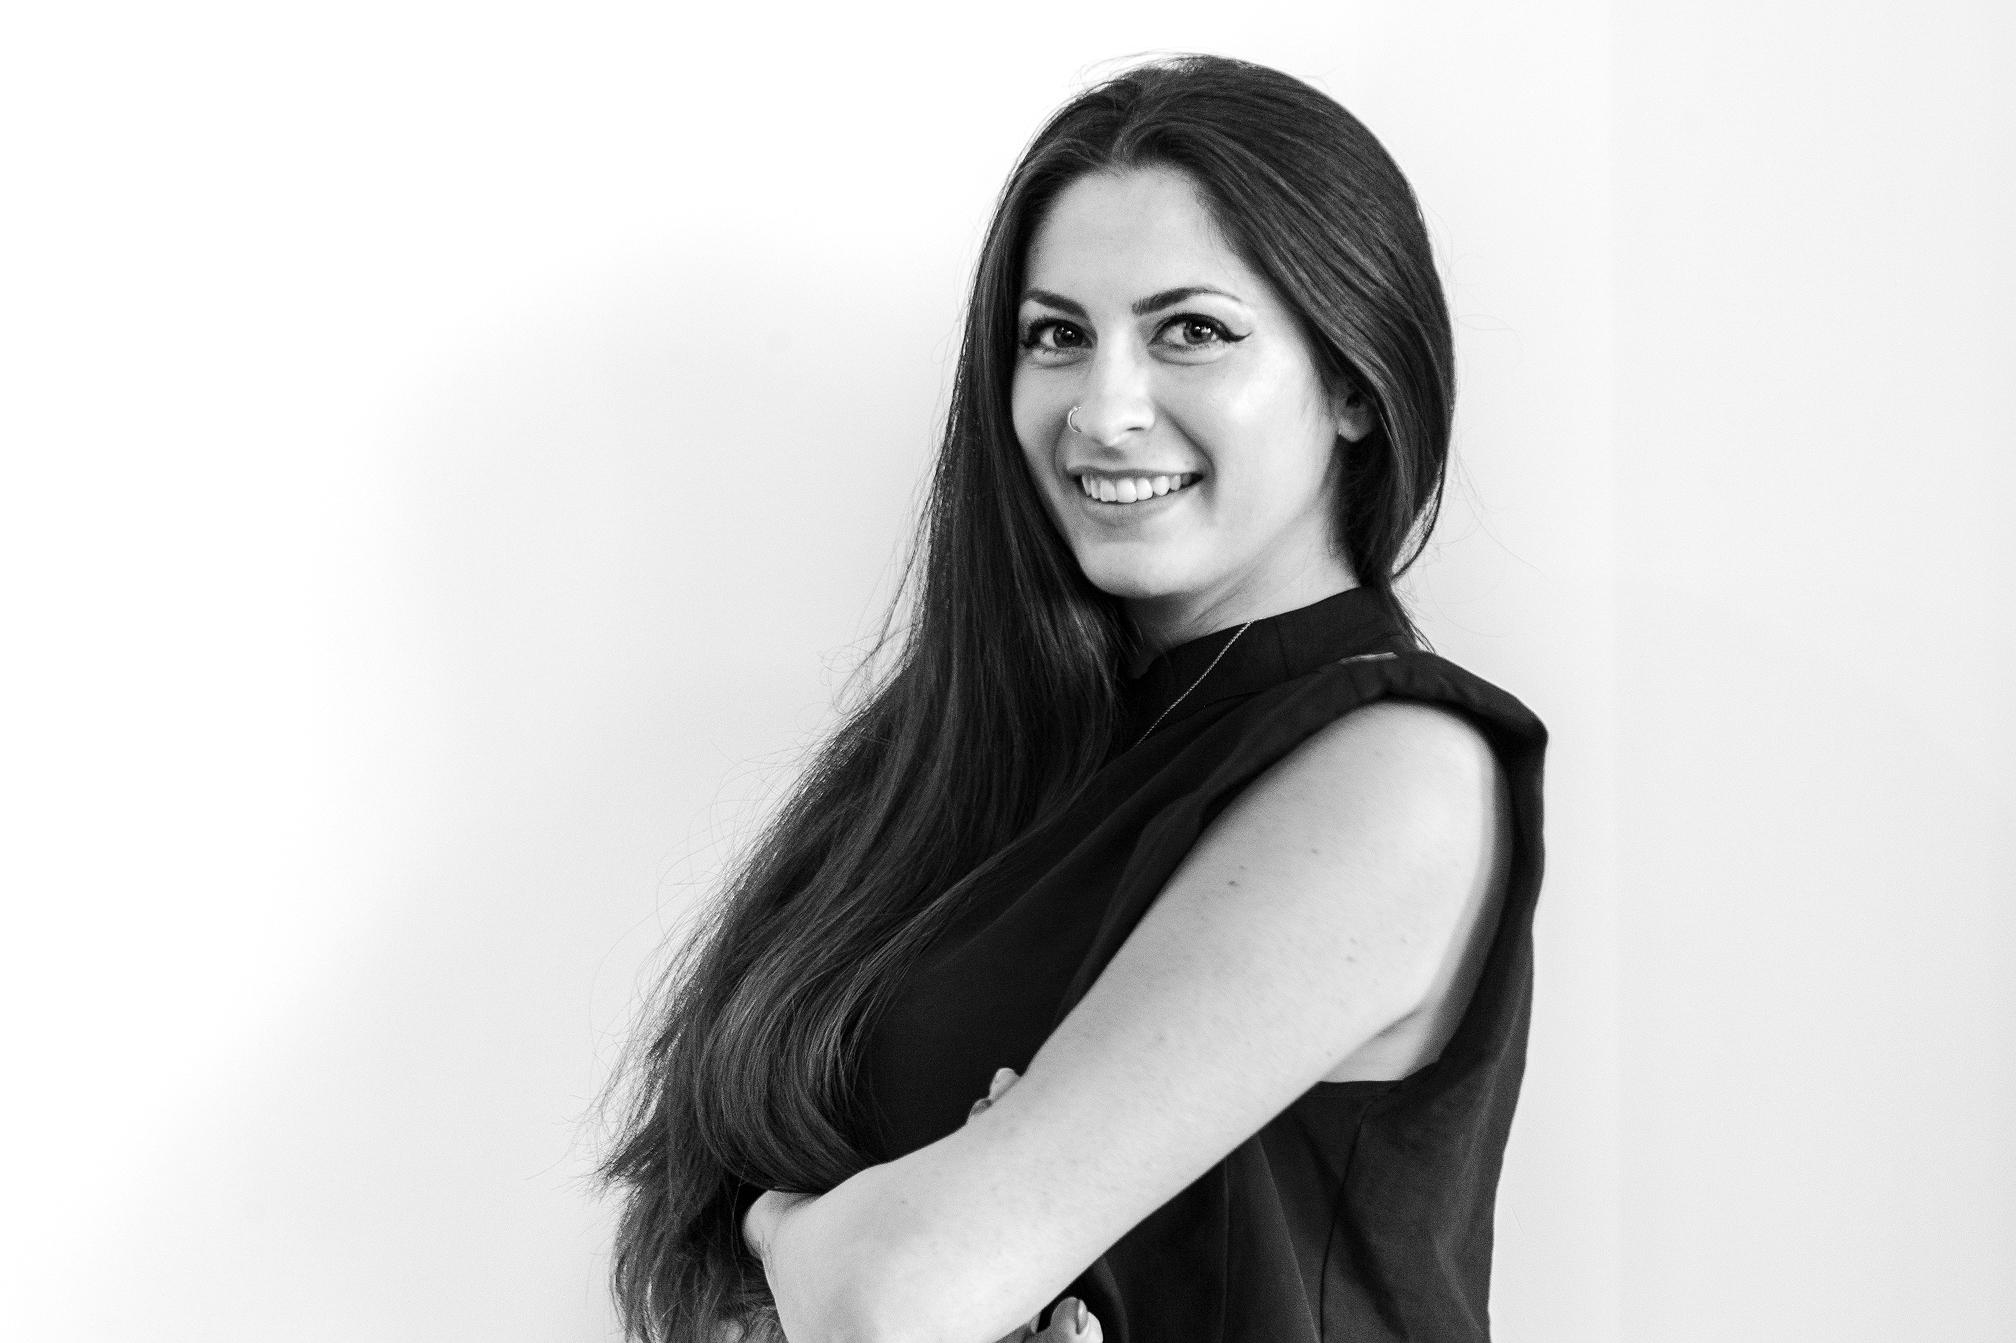 Elena Mourantidi